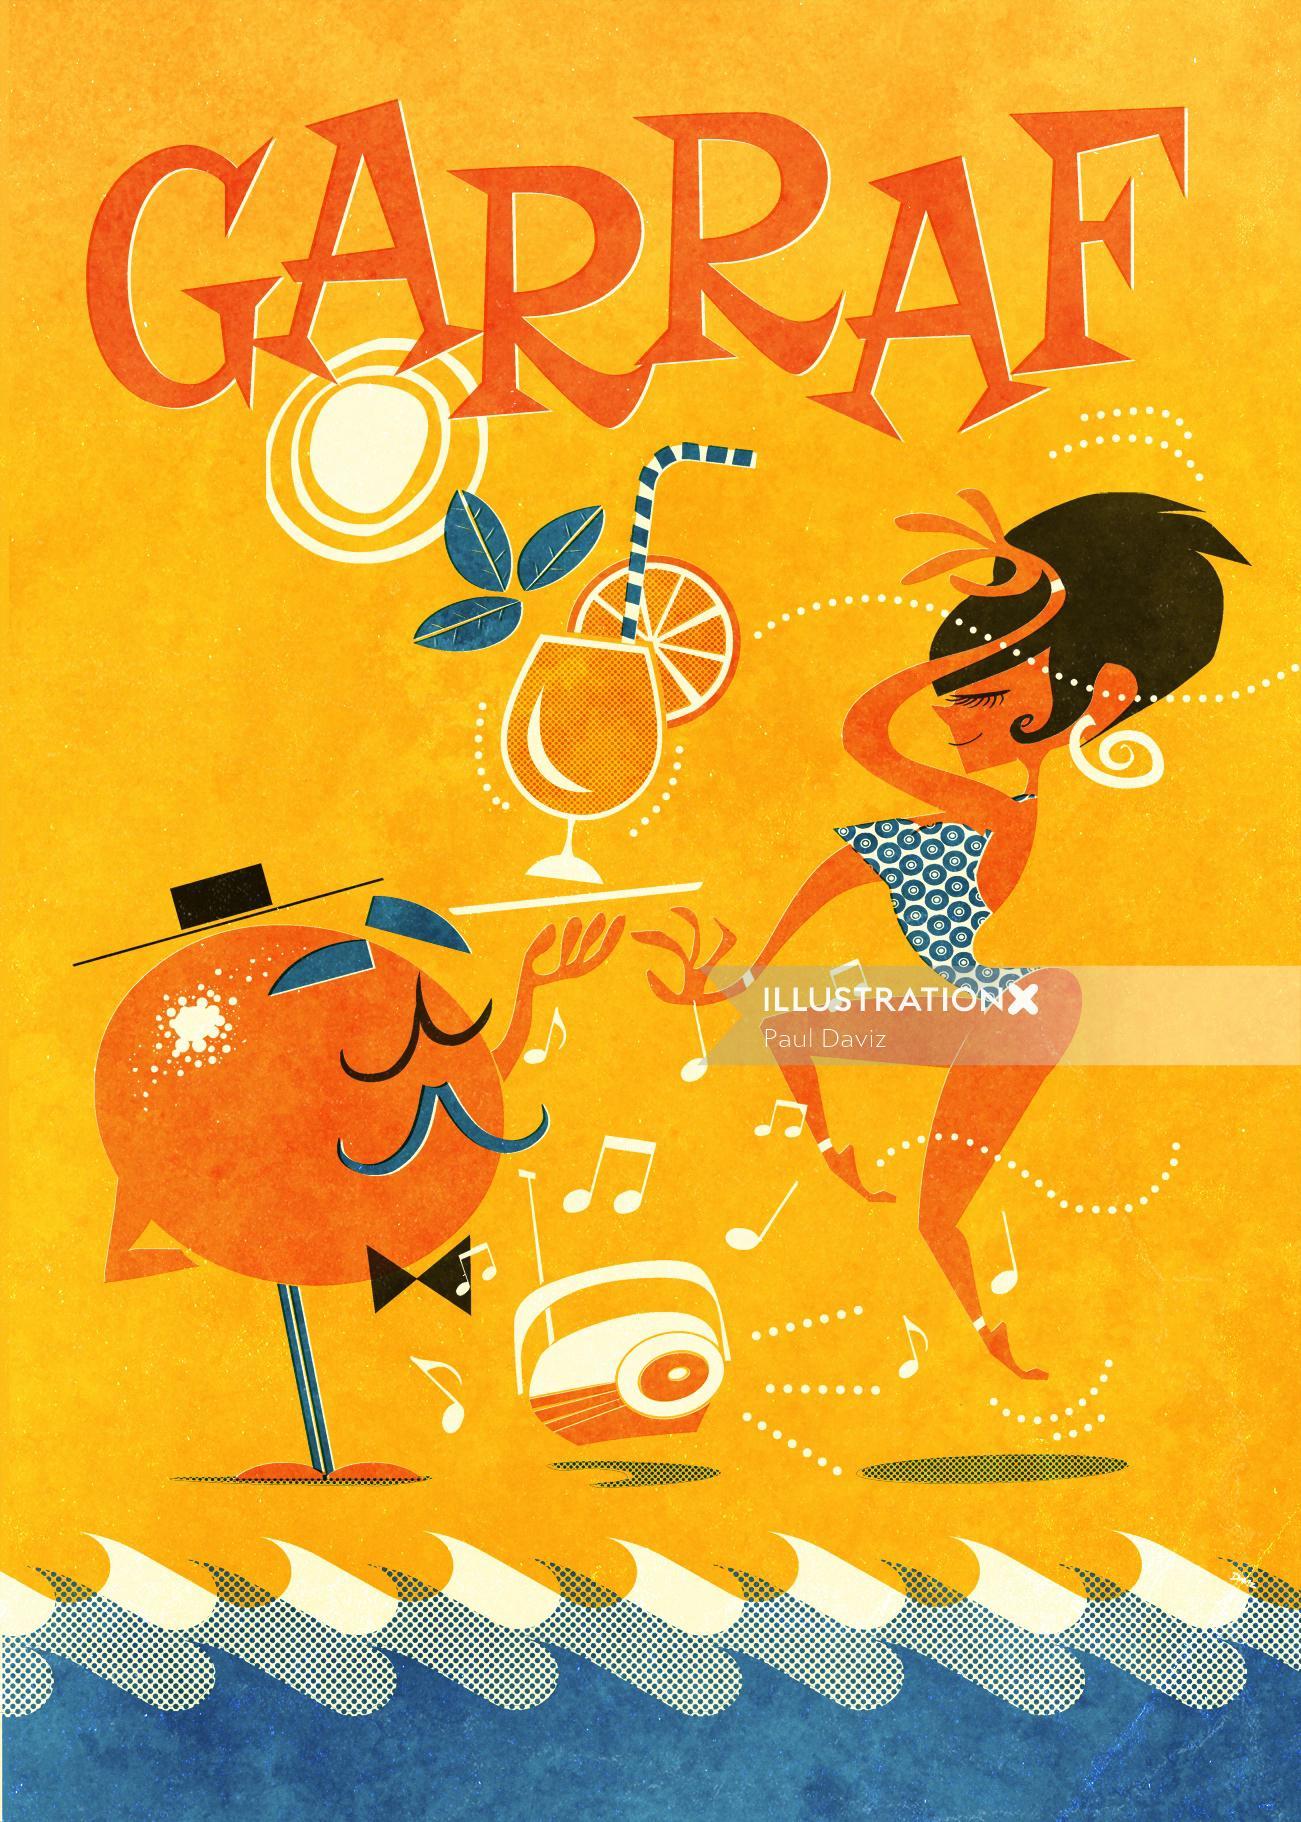 People Garraf Orange and woman party